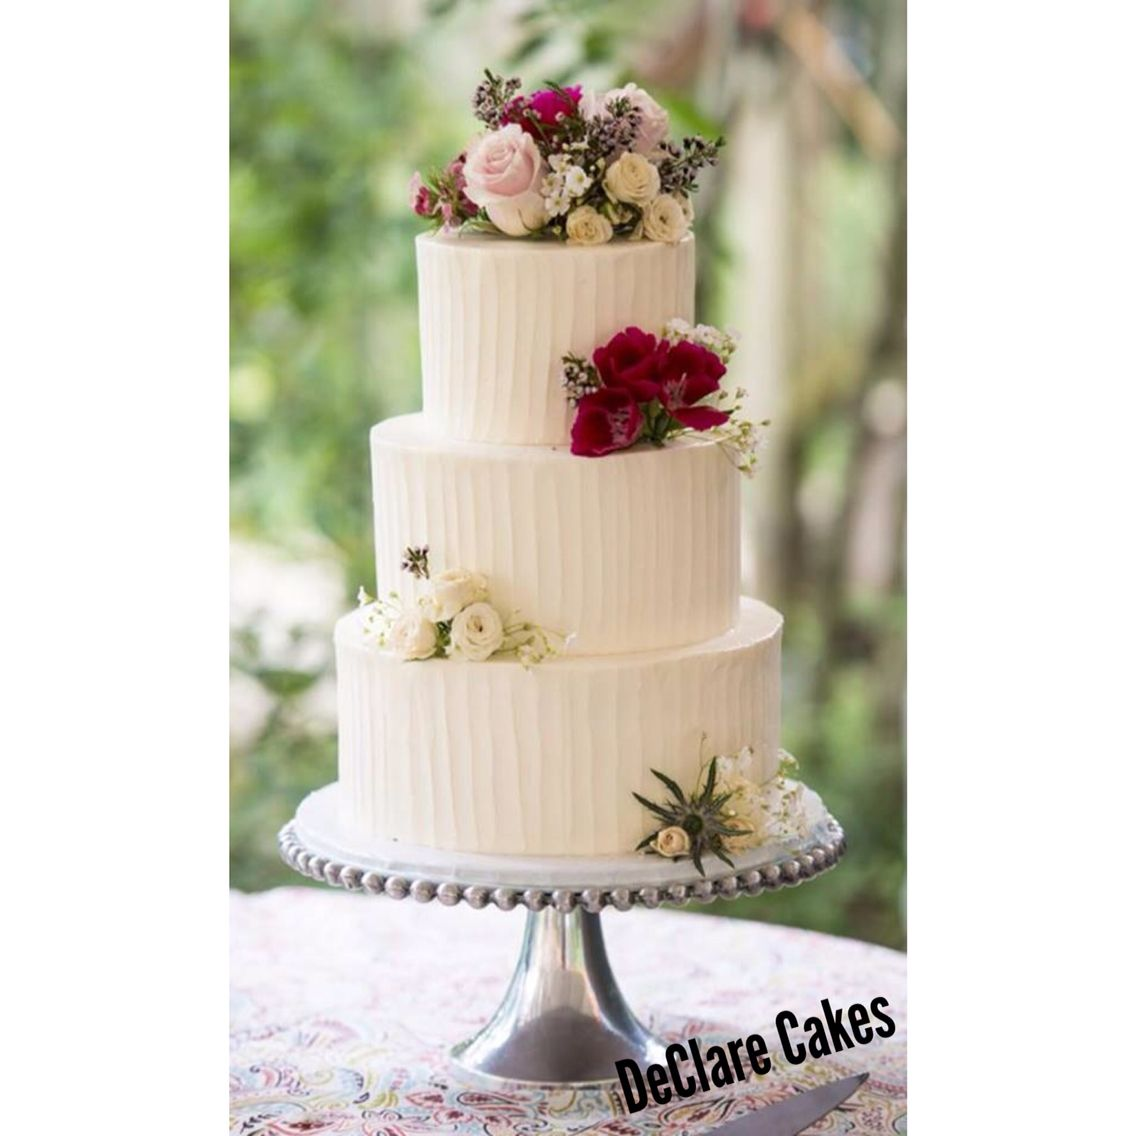 Awesome DeClare Cakes, Charleston, SC. Wedding Cake Declarecakes.com